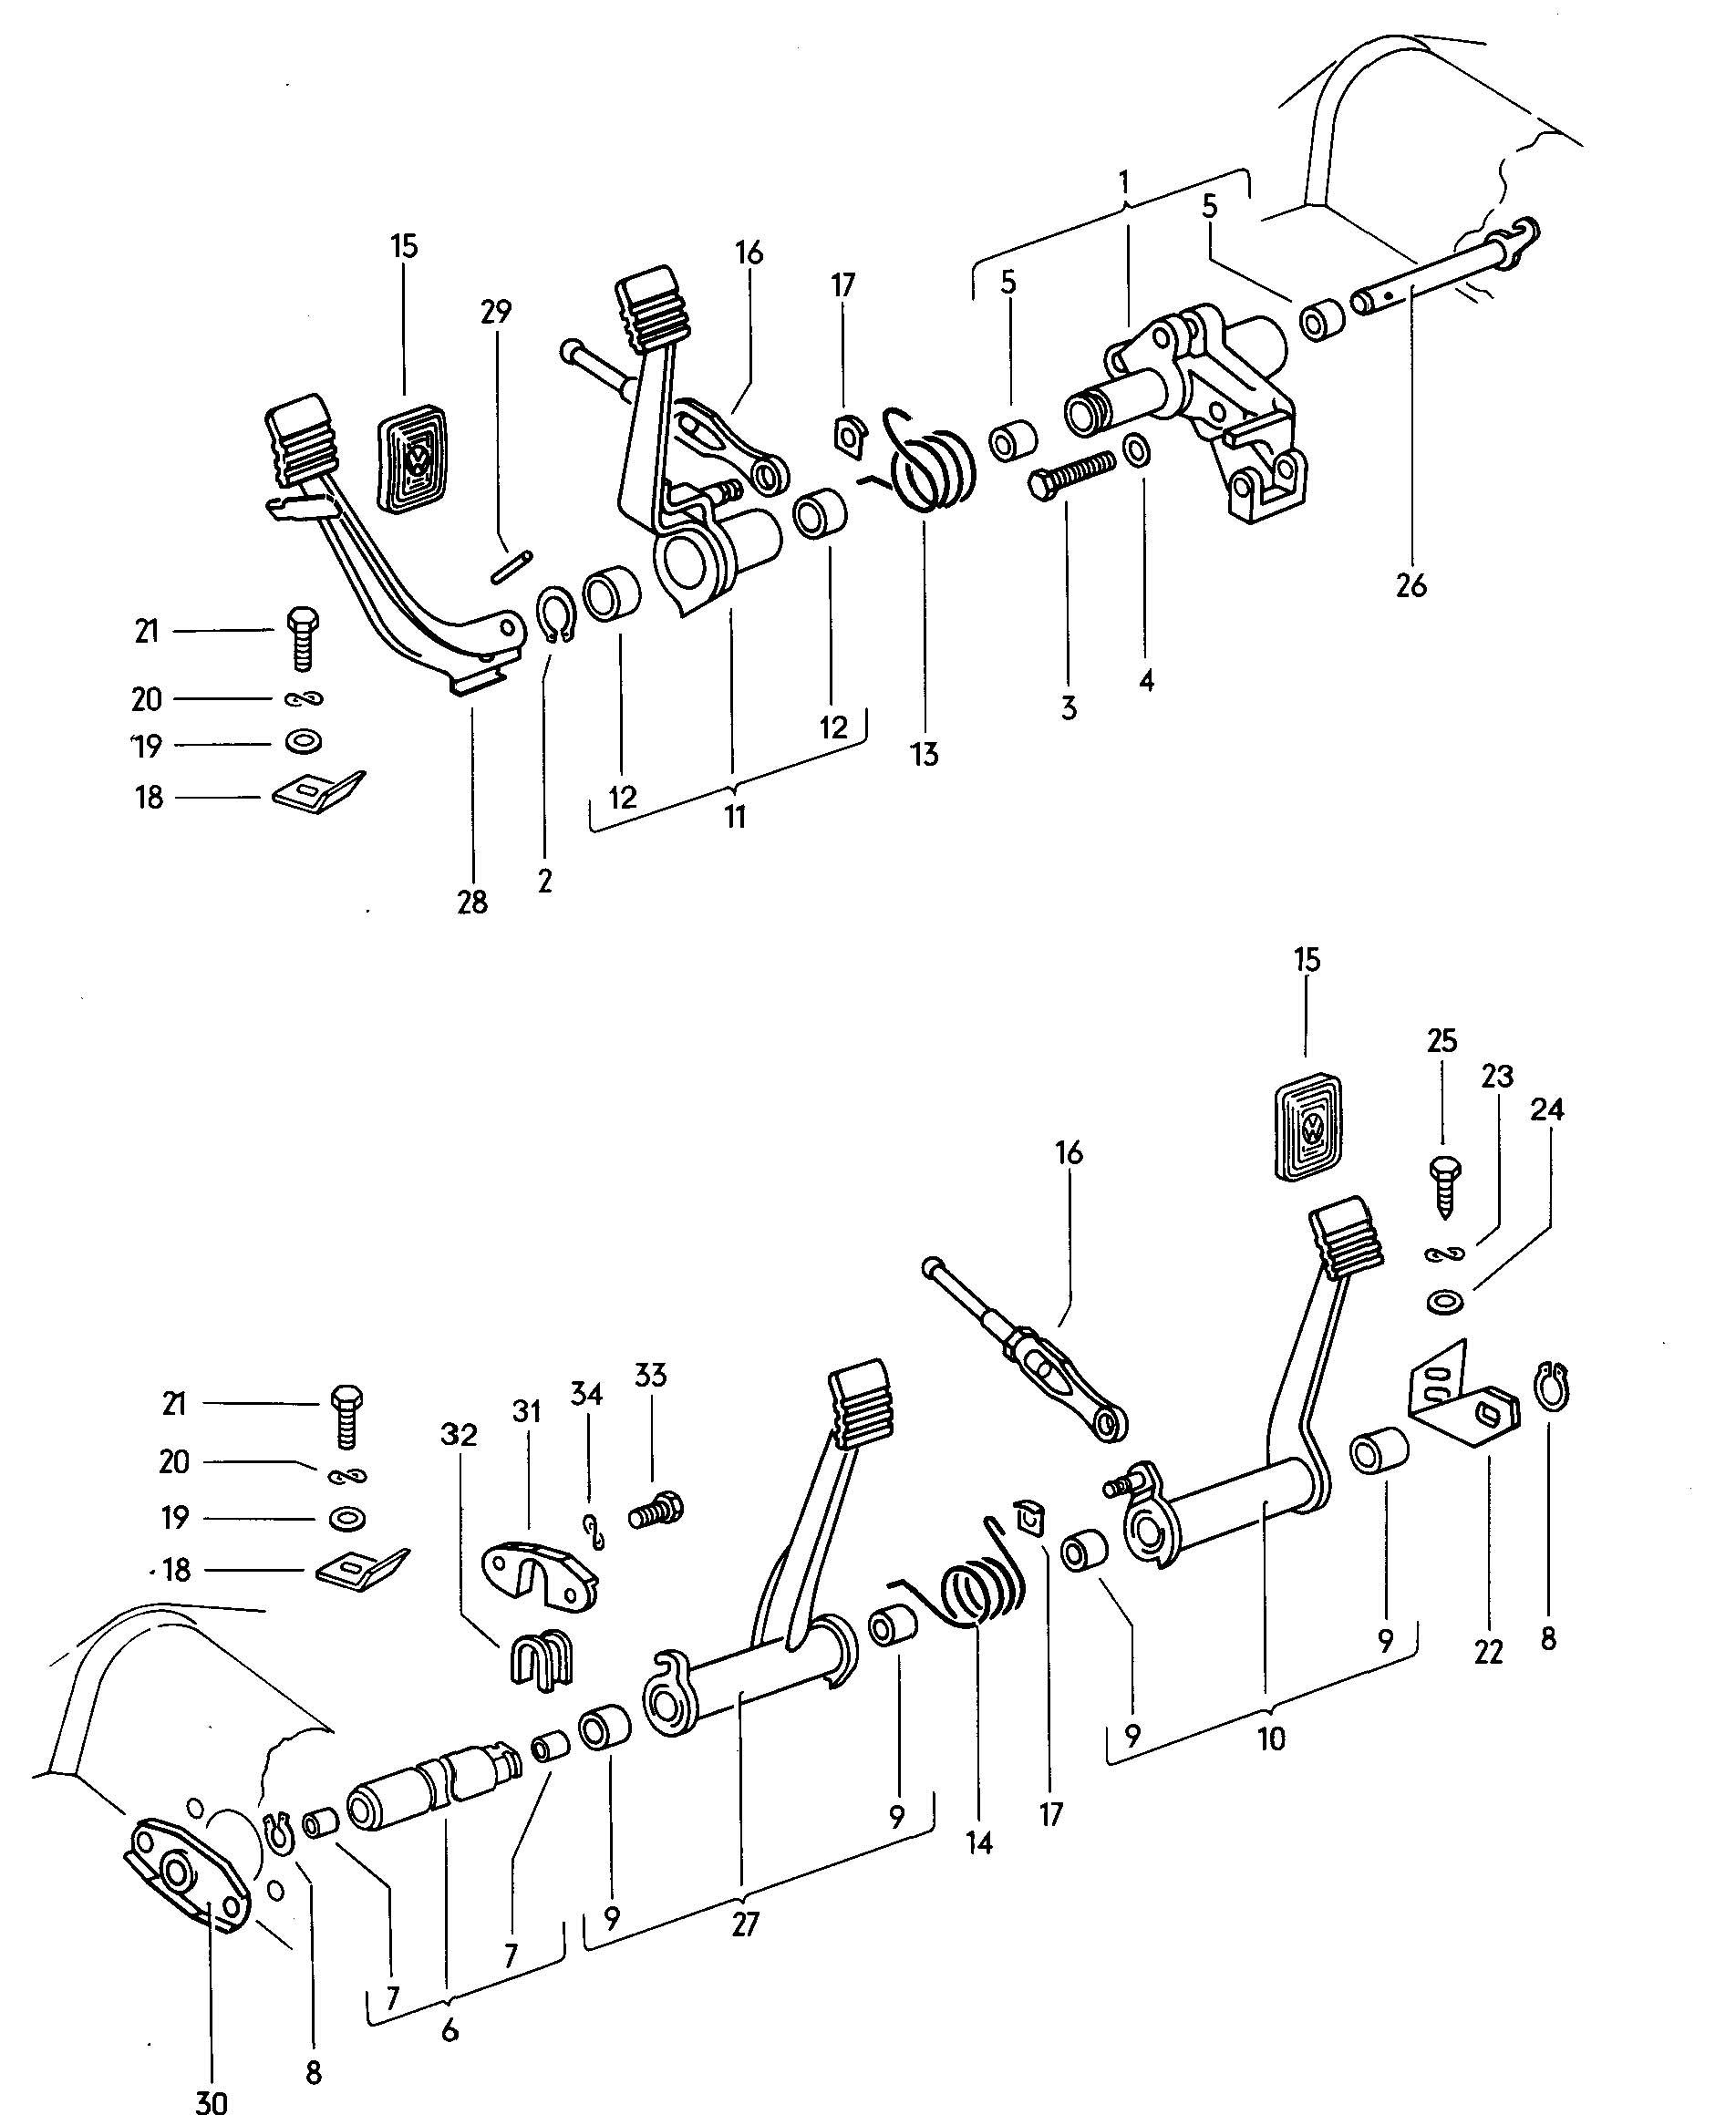 Vw Sand Rail Wiring Diagram Headlight VW Manx Wiring